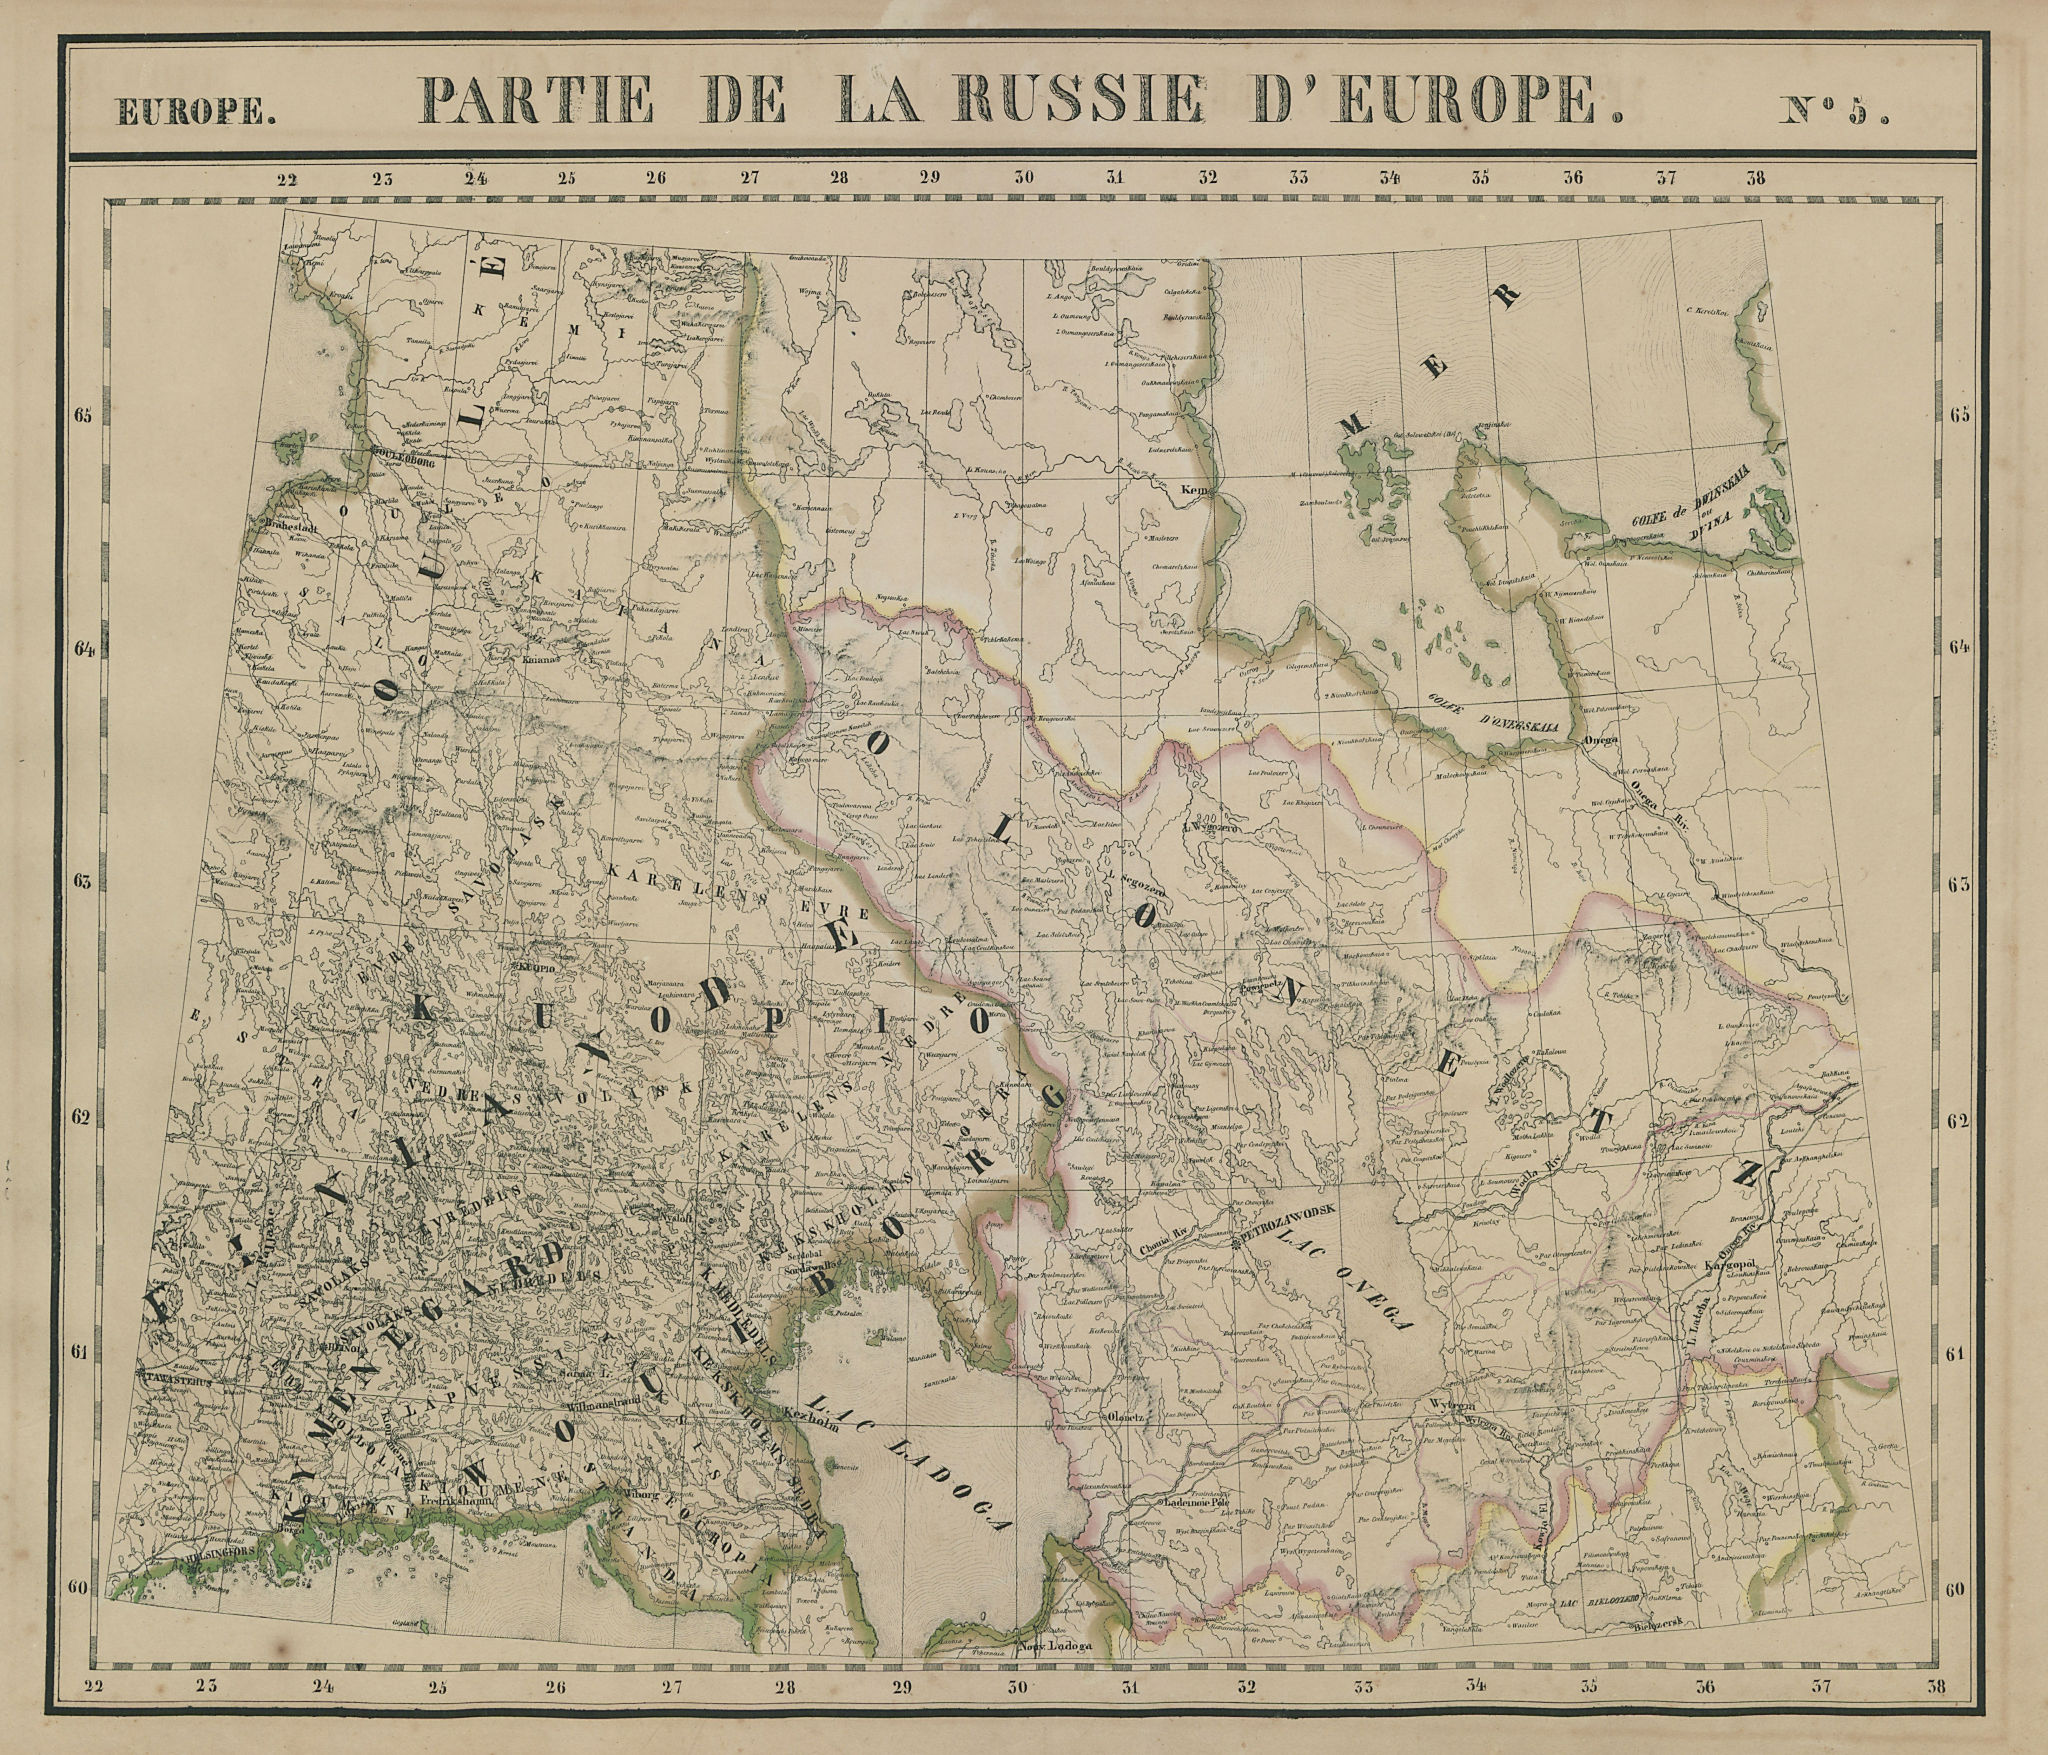 Russie d'Europe #5 Finland. Northwest Russia. Karelia. VANDERMAELEN 1827 map